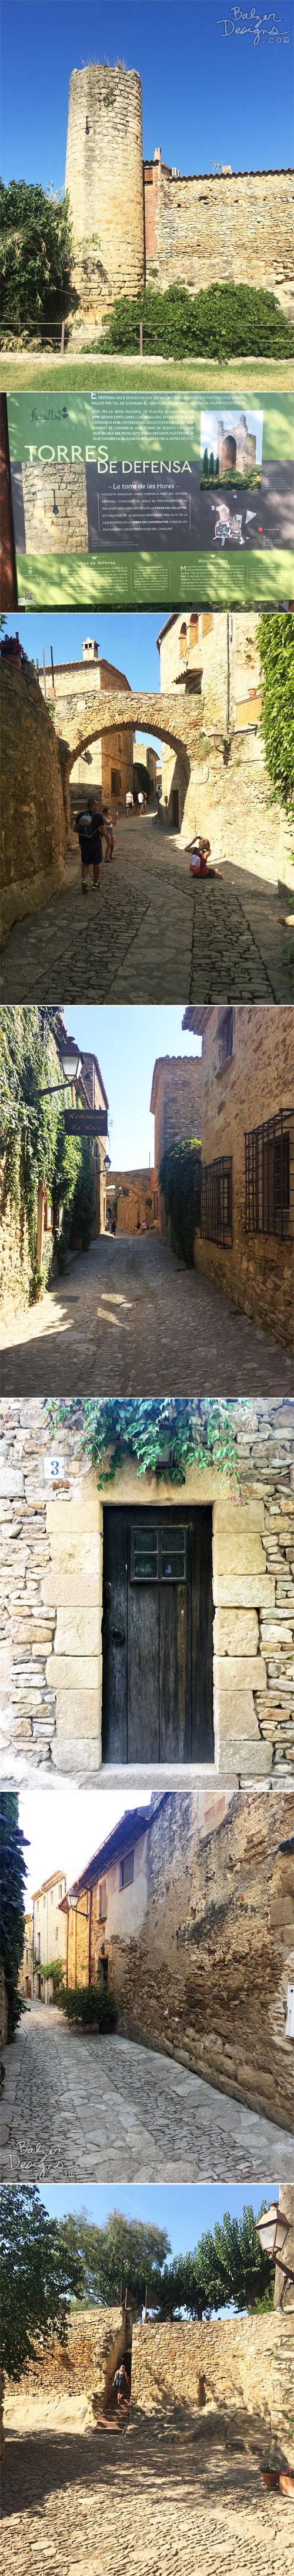 From the Balzer Designs Blog: Medieval Village: Pals